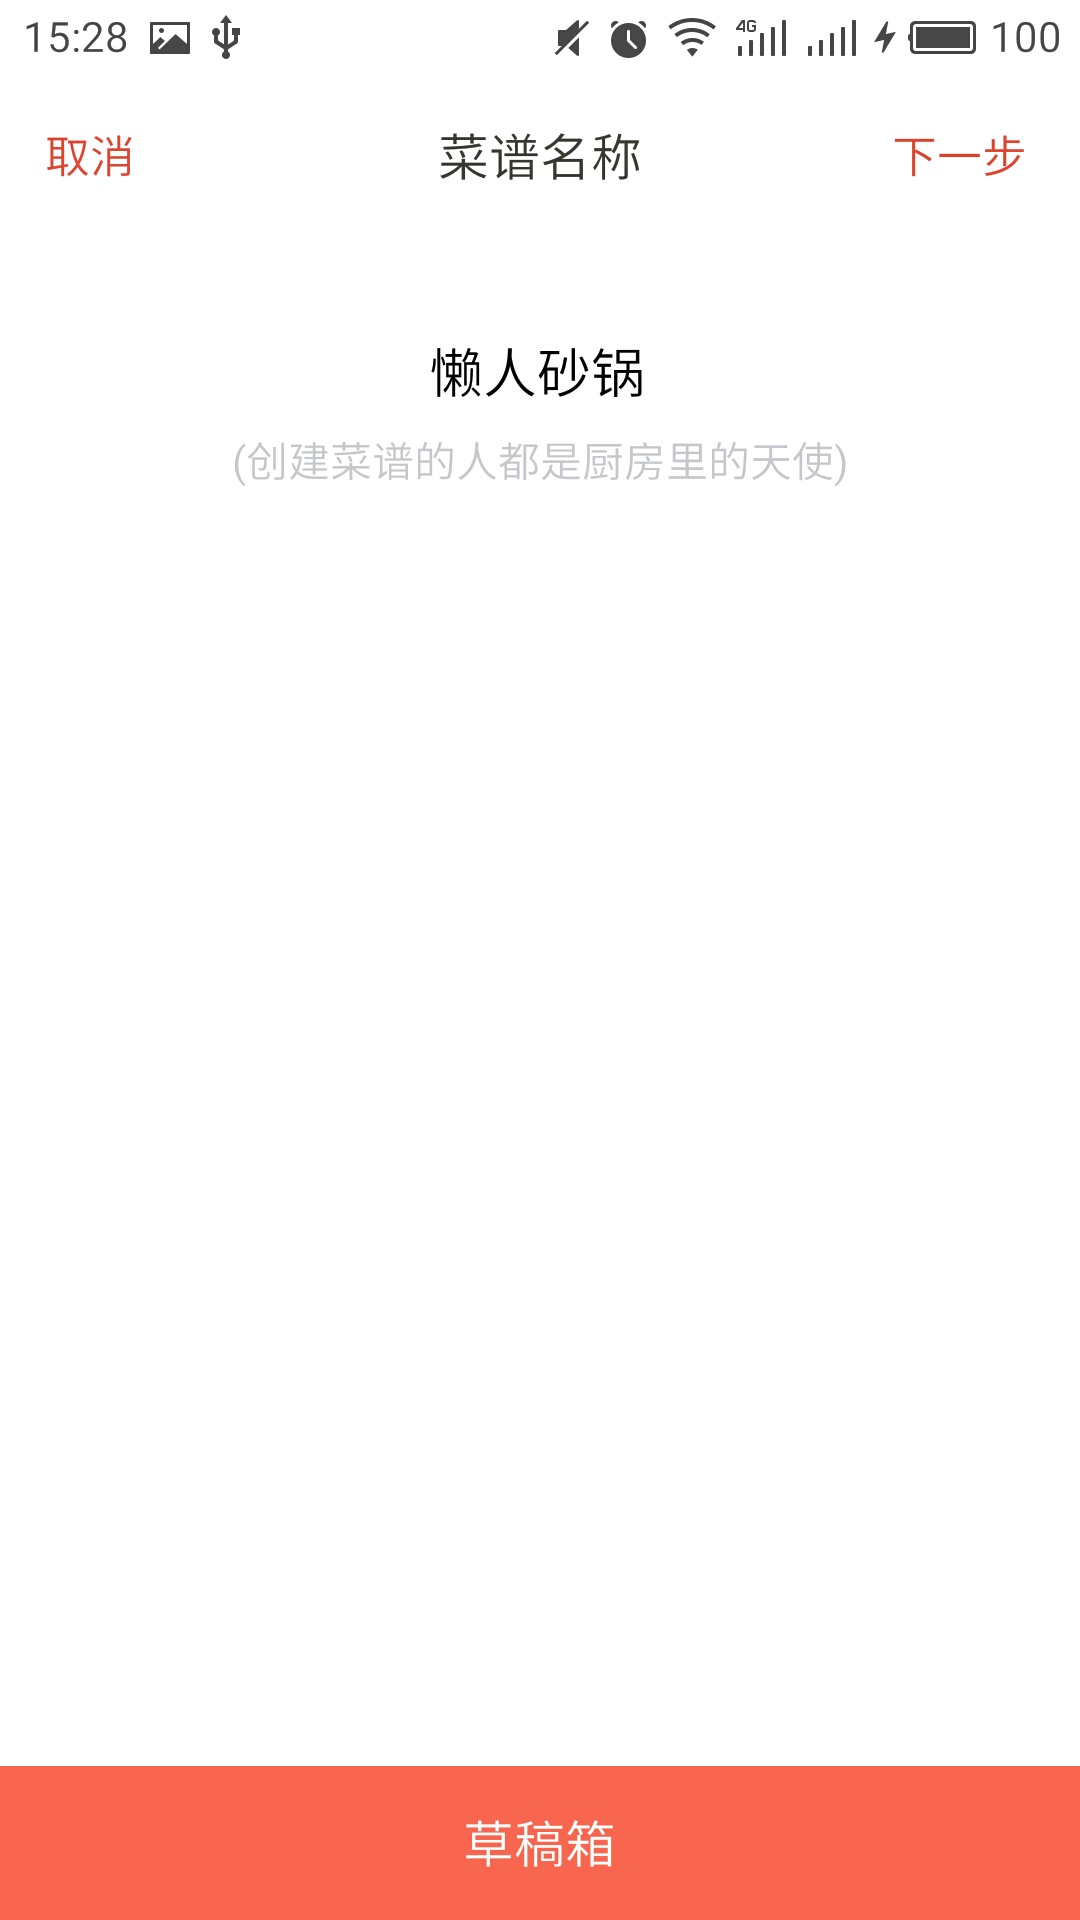 S60914-15285467.jpg